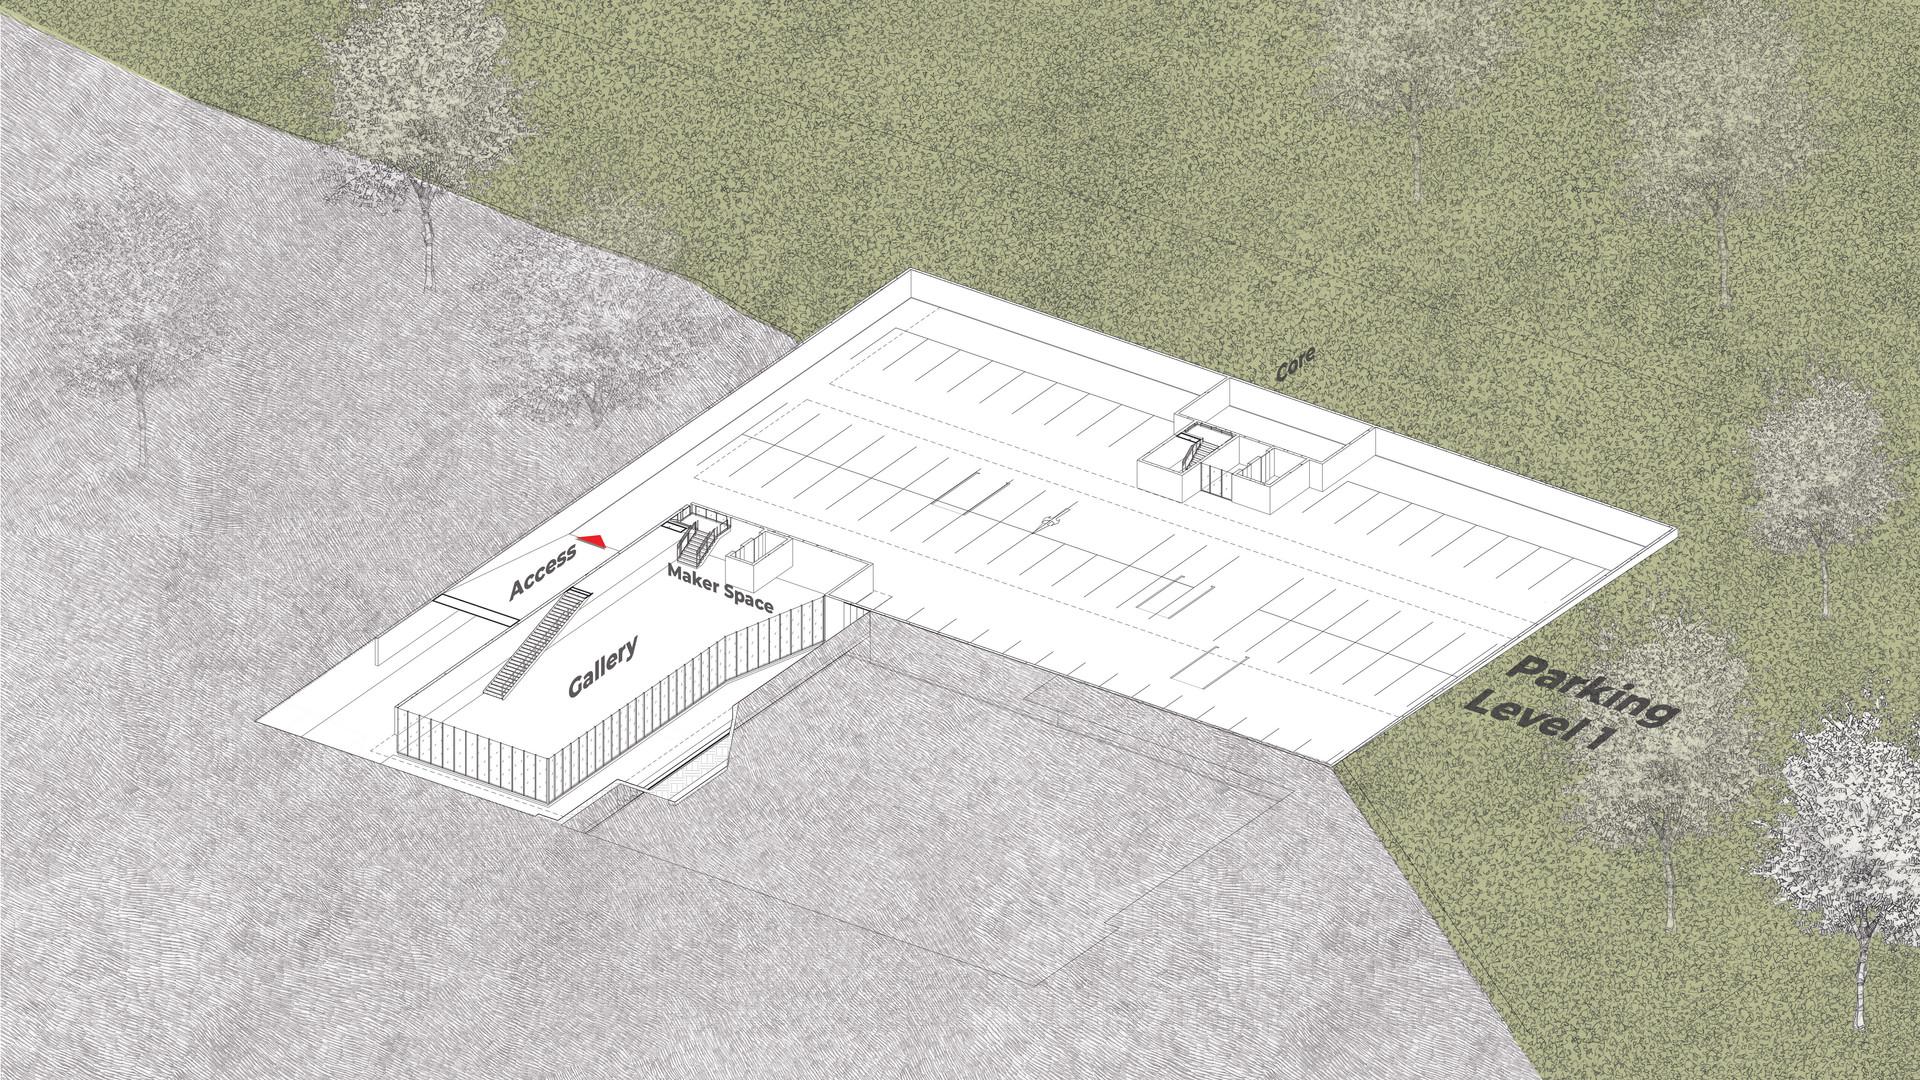 02 Axonometric parking.jpg